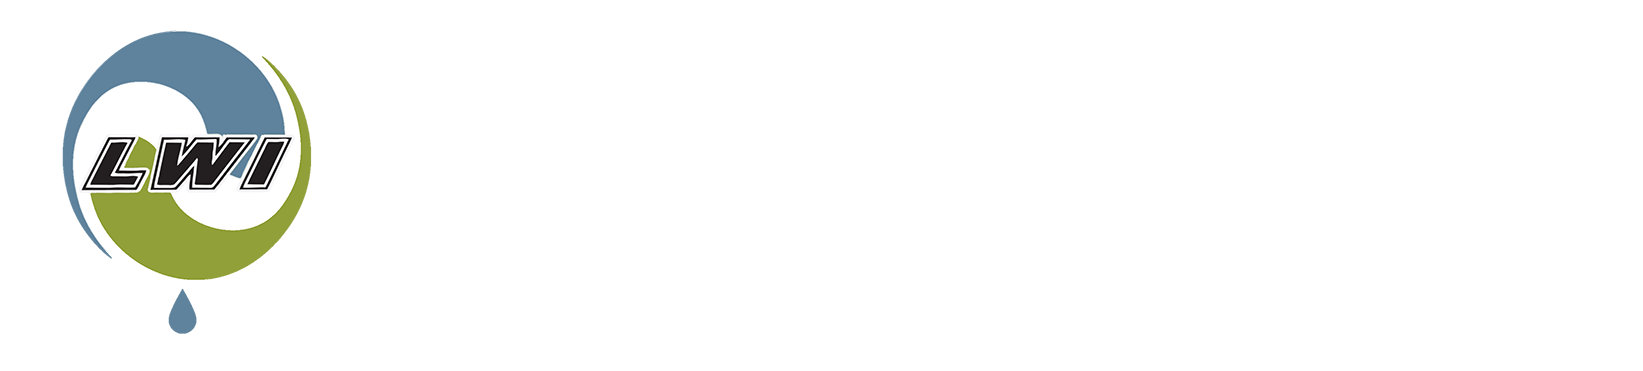 Liquid Waste Industries, Inc